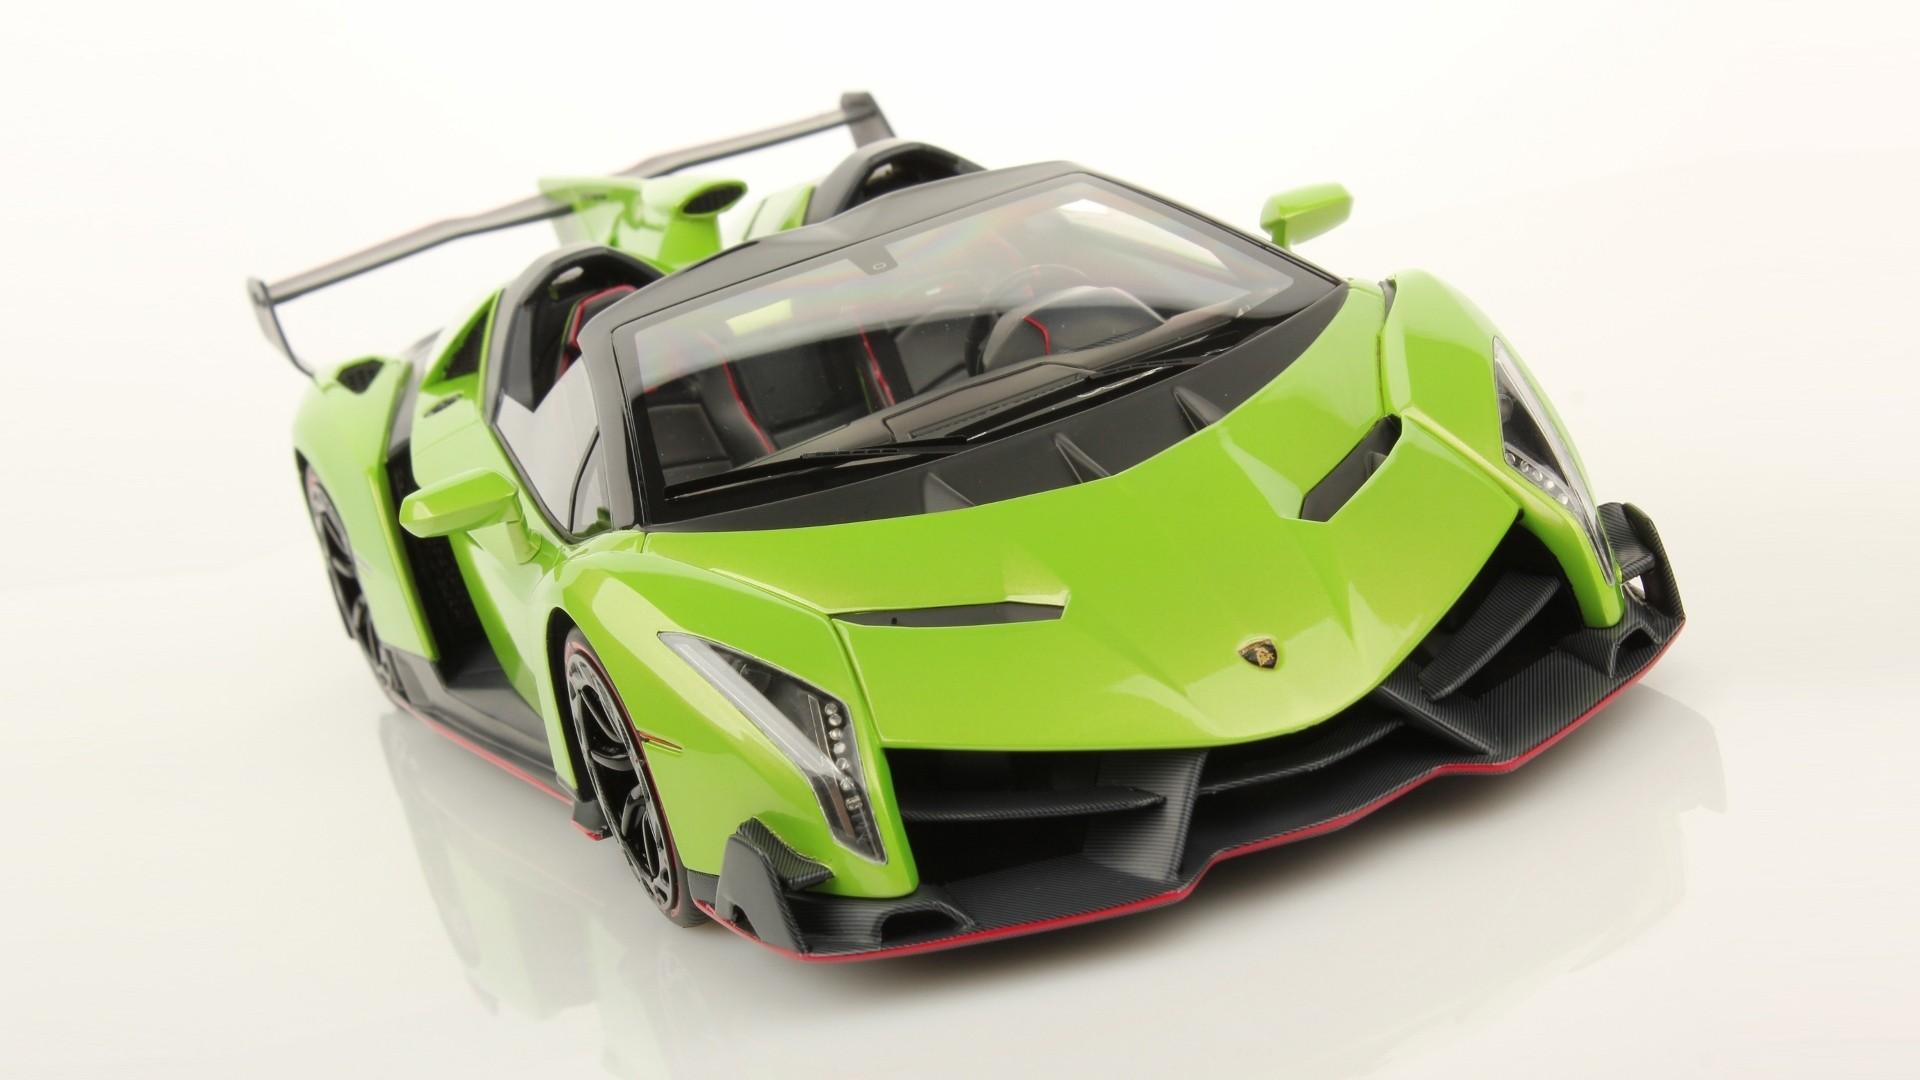 Wallpapers Green And Lamborghini On Pinterest: Wallpaper : Lamborghini Aventador, Sports Car, Lamborghini